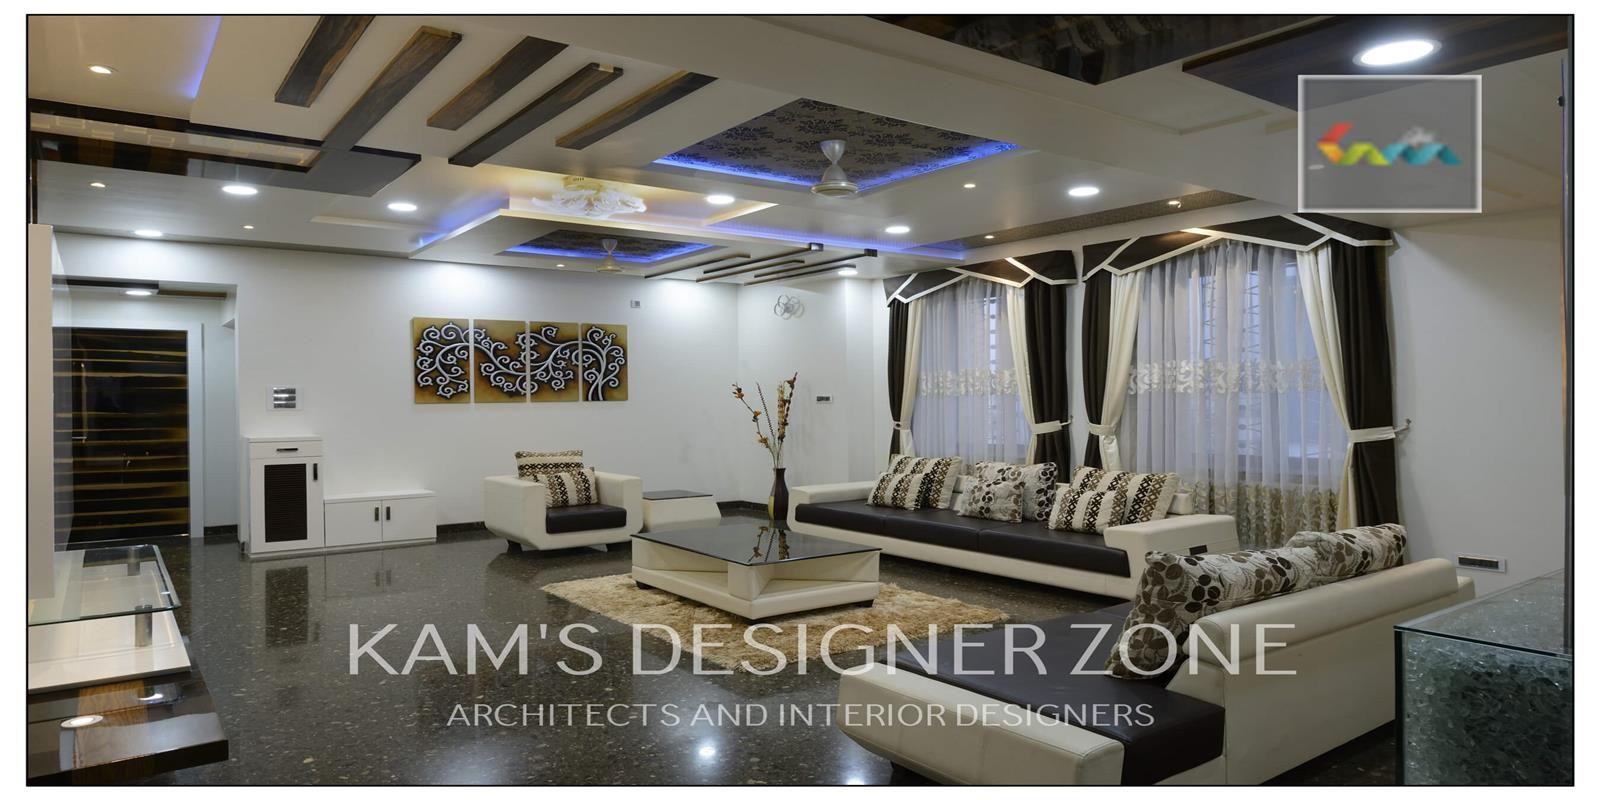 Best Interior Designer In Vishrantwadi Kams Designer Pune Top